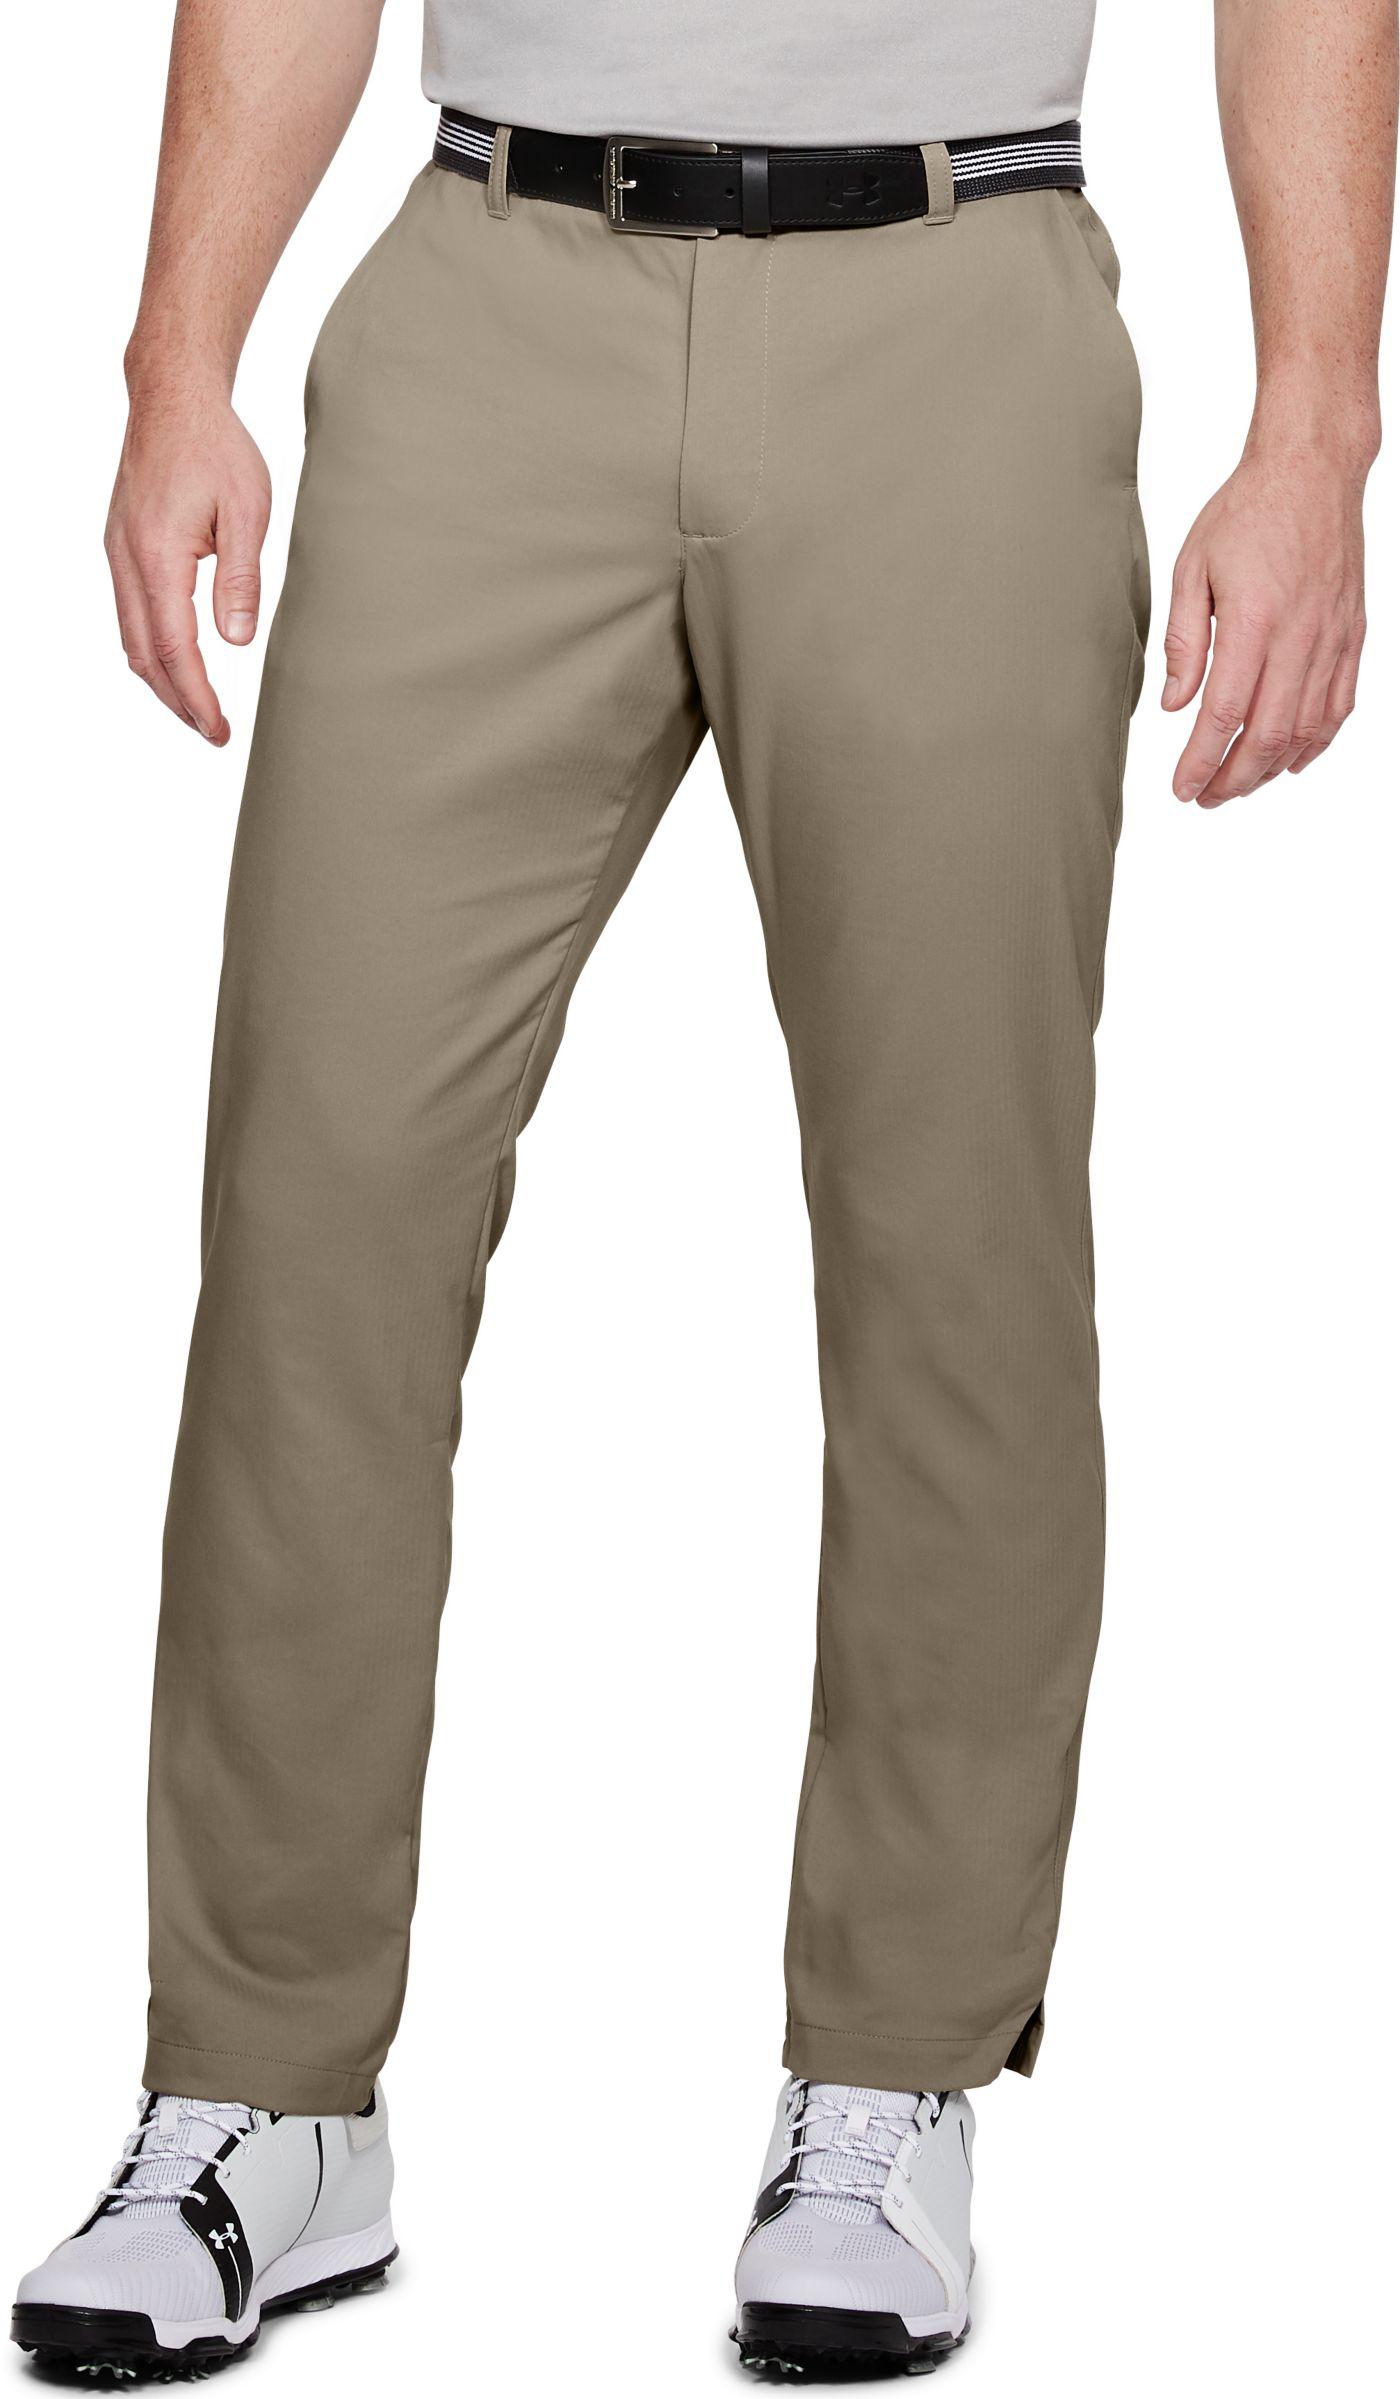 Under Armour Men's Showdown Straight Golf Pants